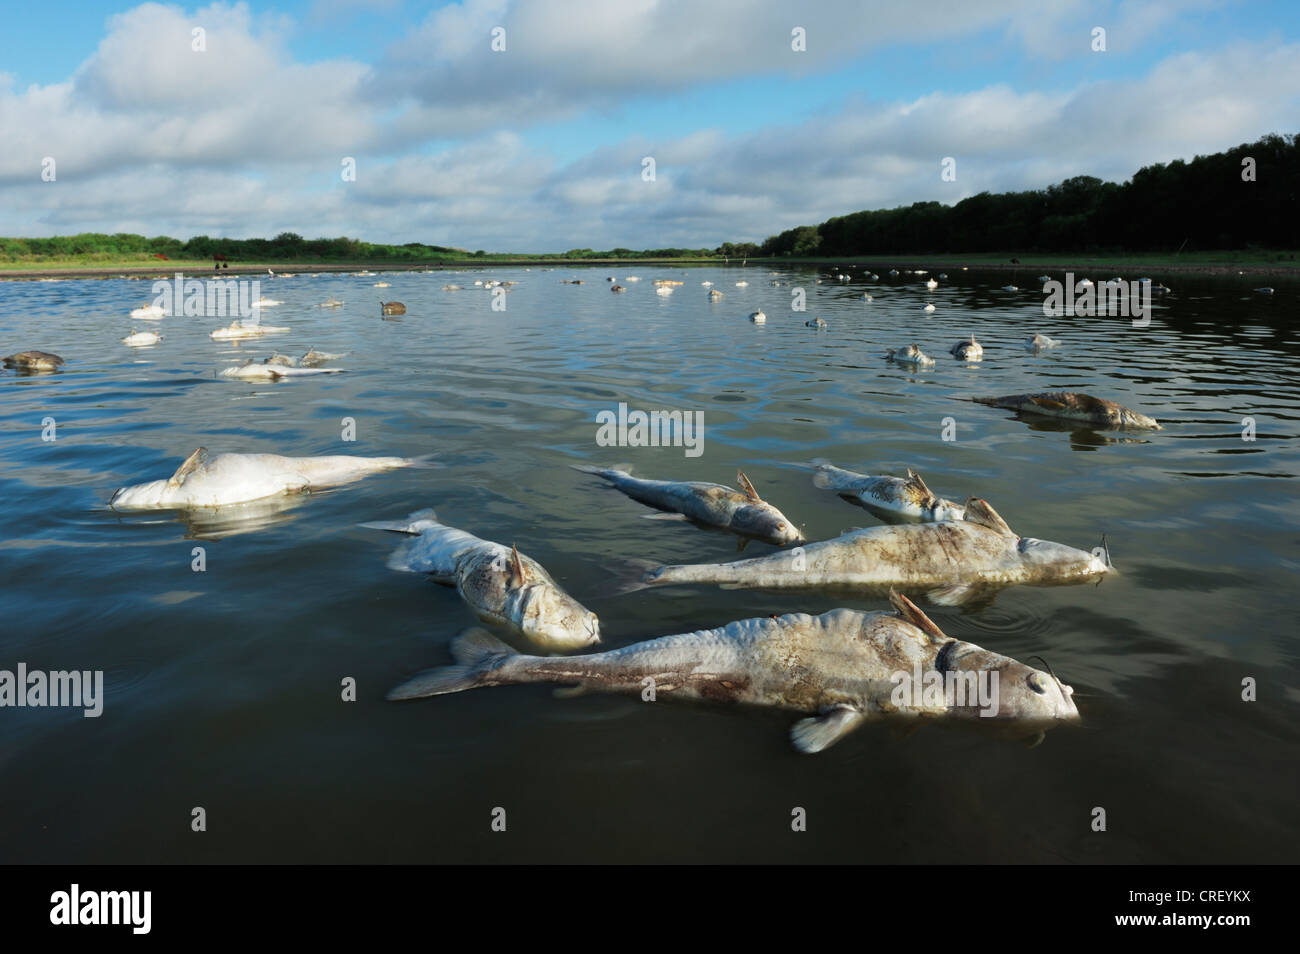 Fish carcasses in lake during drought, Dinero, Lake Corpus Christi, South Texas, USA - Stock Image